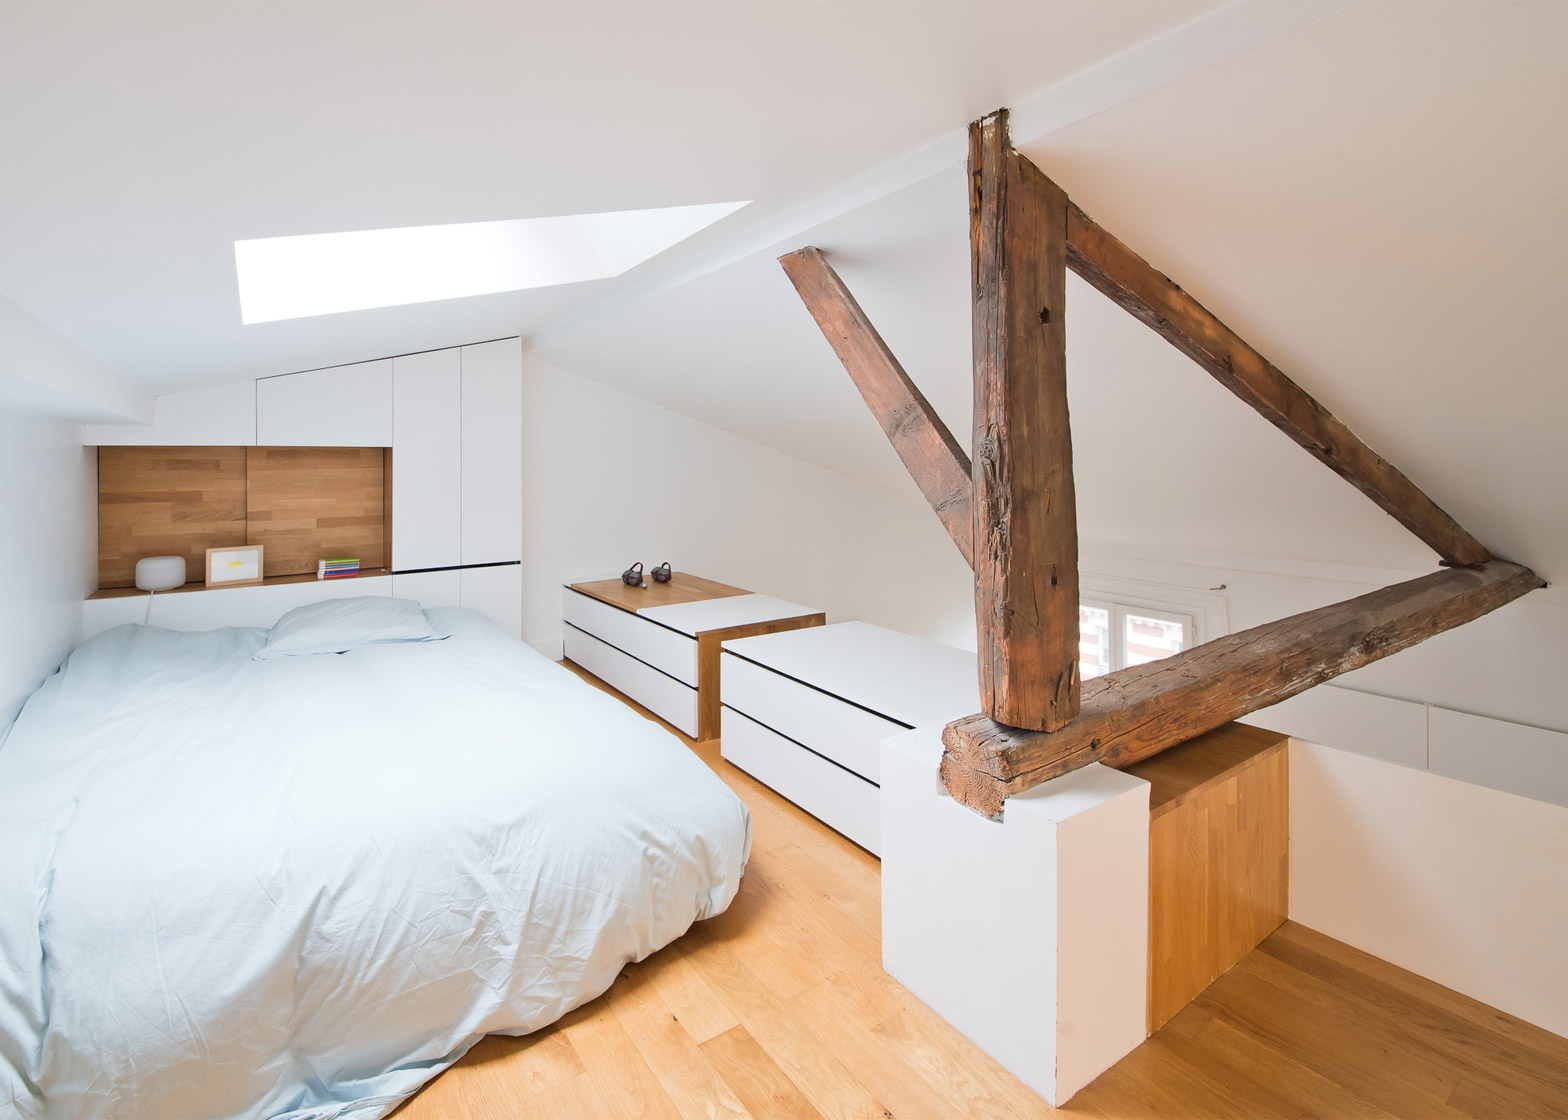 SABO Project transforms Paris interior with space-saving stairs